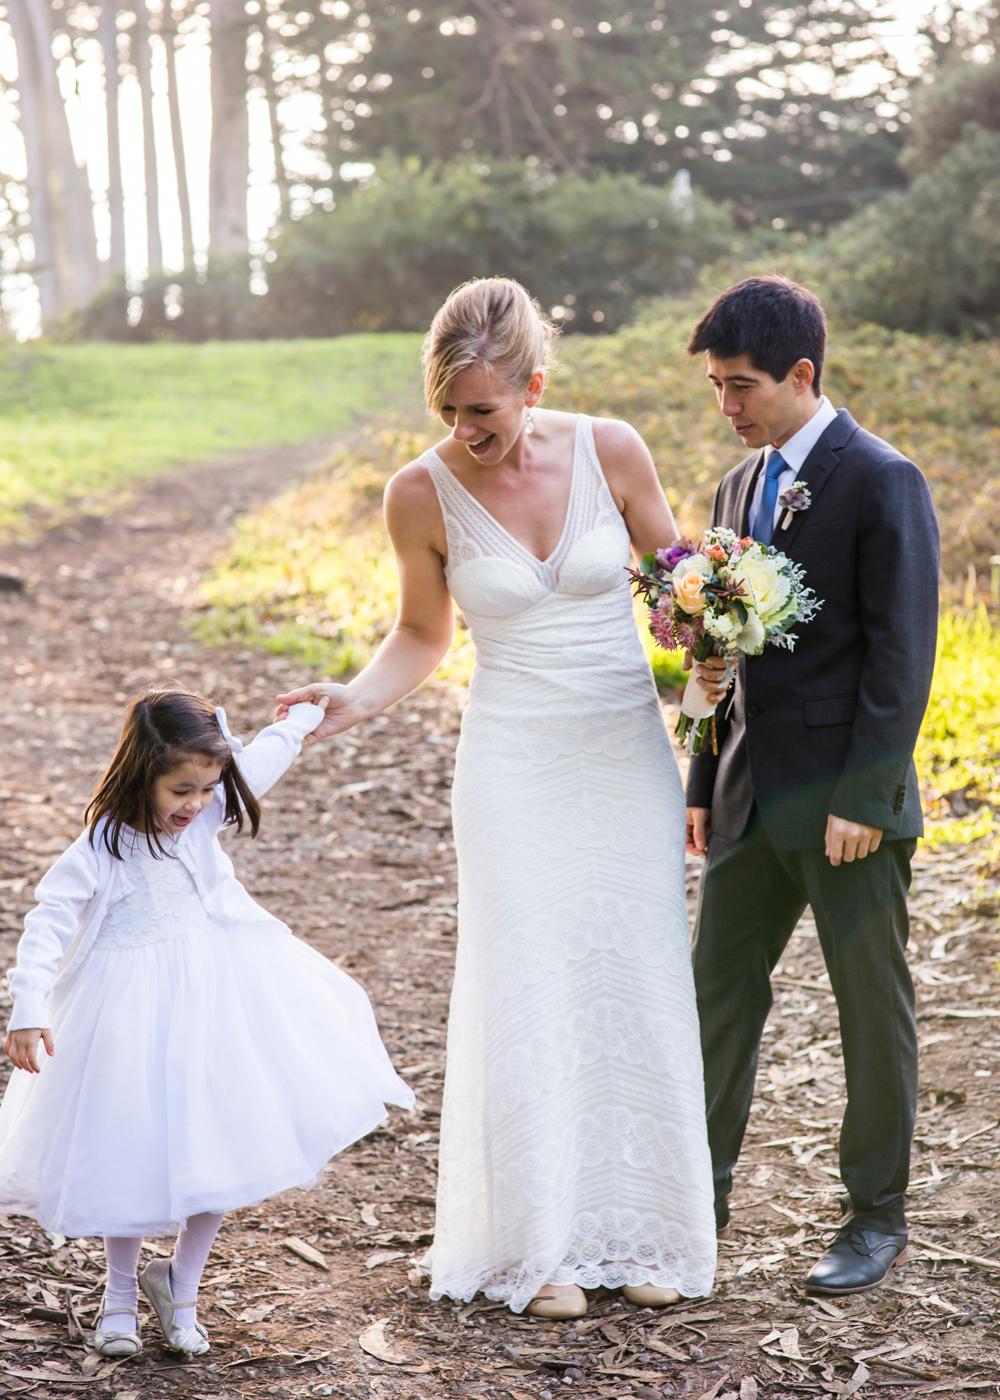 presidio-wedding-photography-lilouette-029.jpg